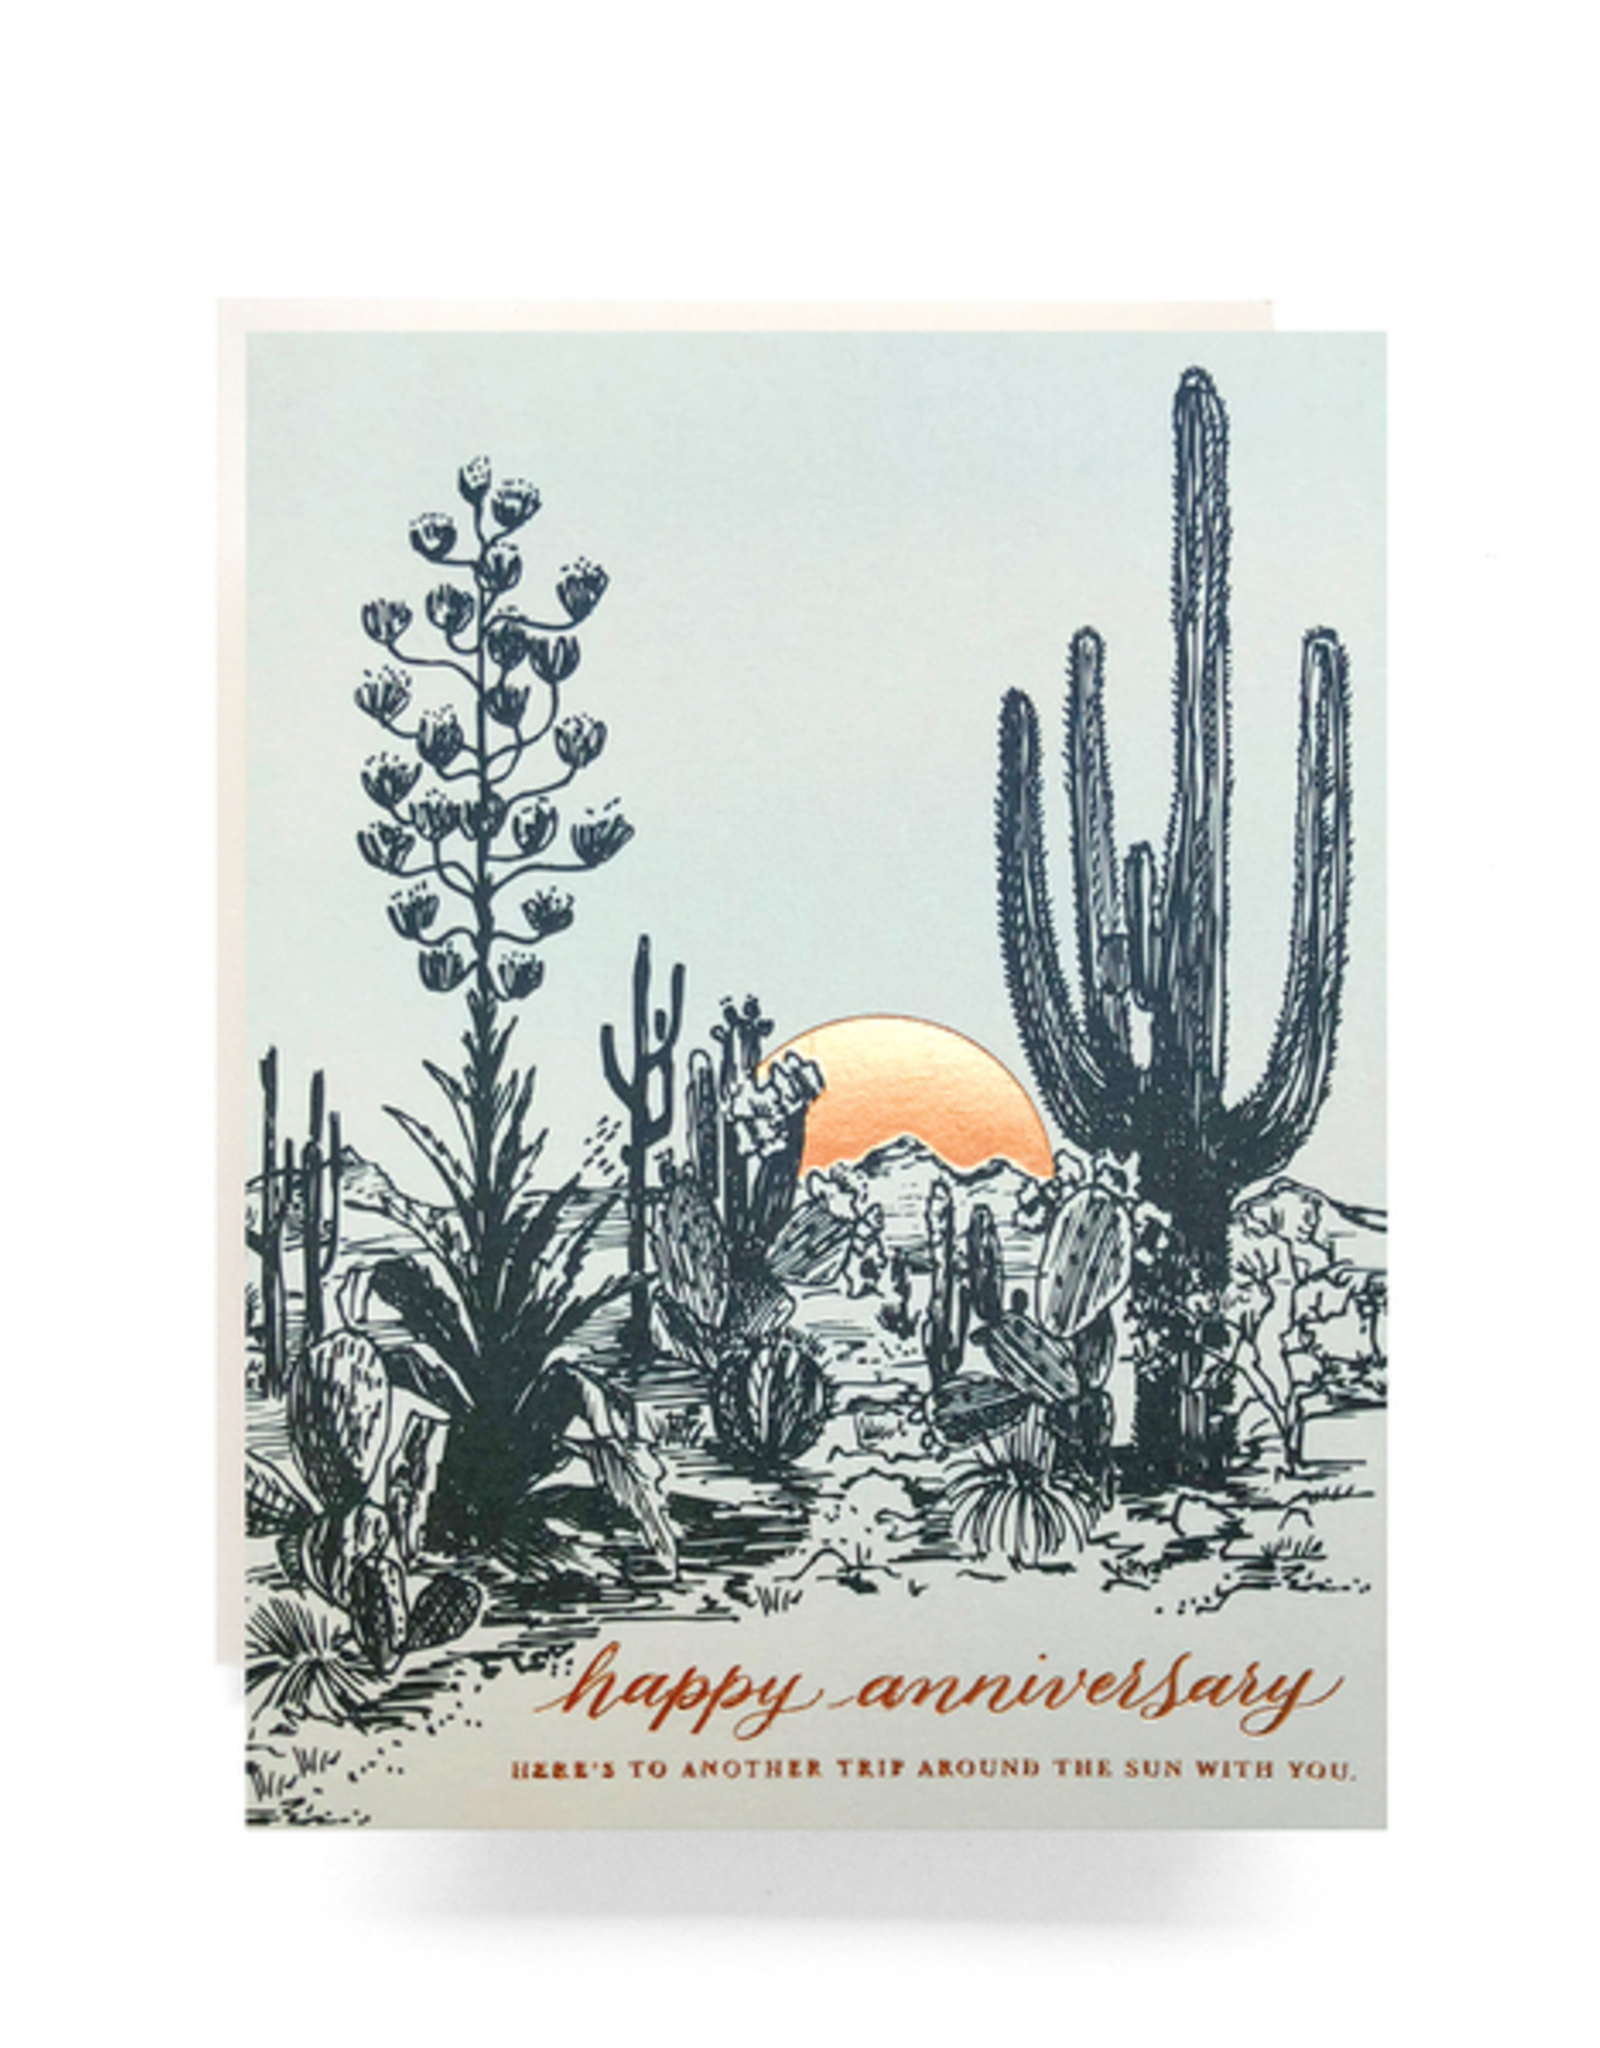 Cactus Sunset Anniversary Card